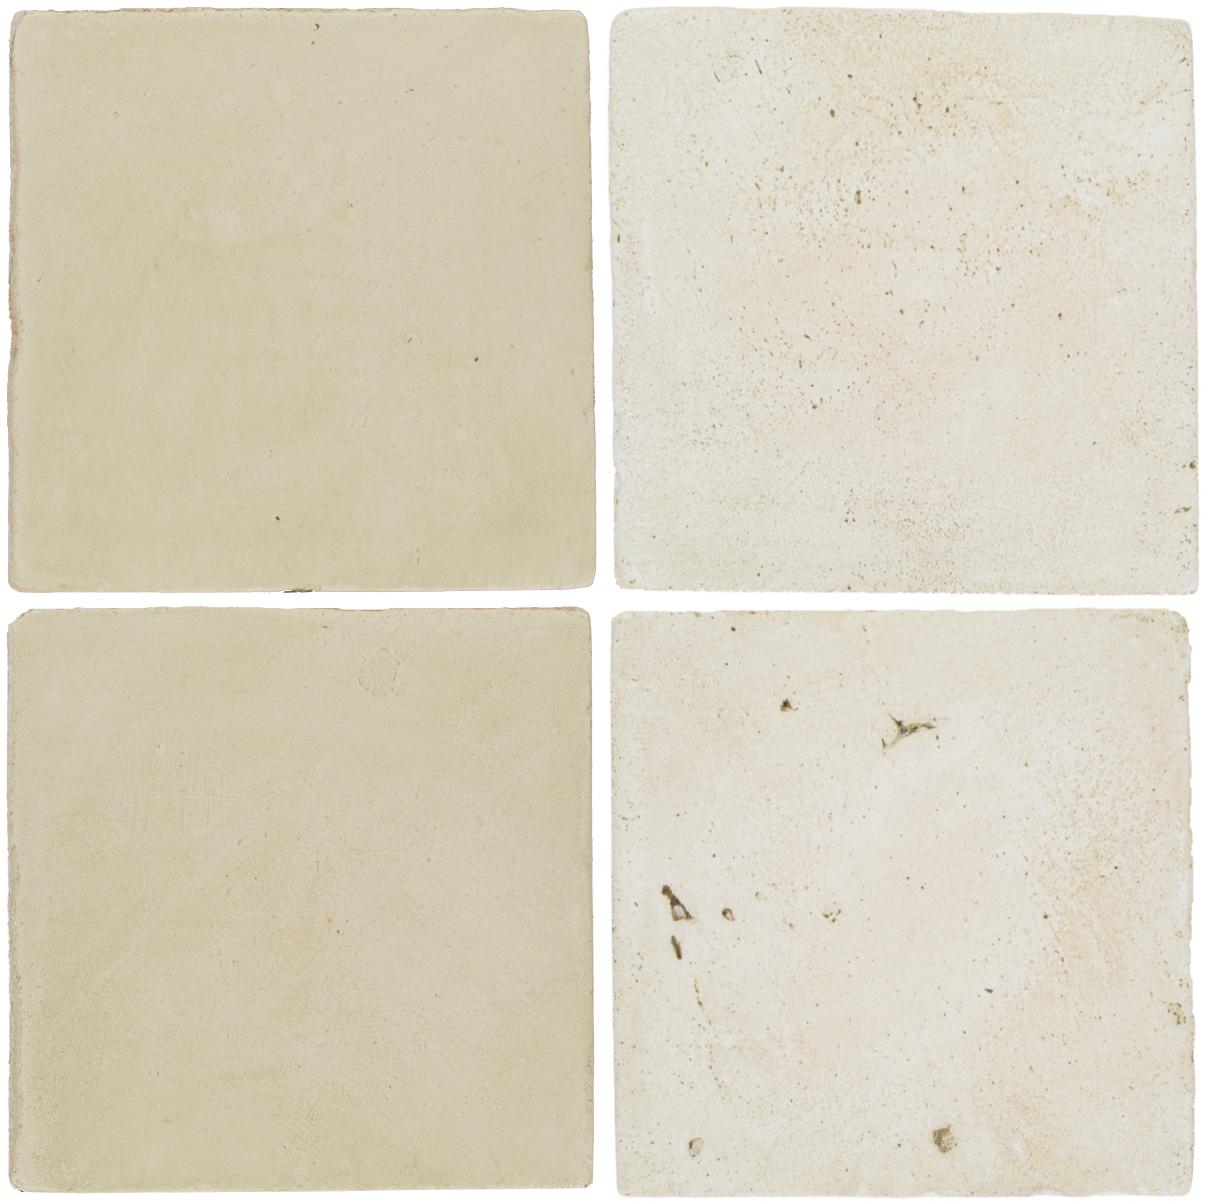 Pedralbes Antique Terracotta  2 Color Combinations  OHS-PGLW Glacier White + VTG-PGAW Antique White